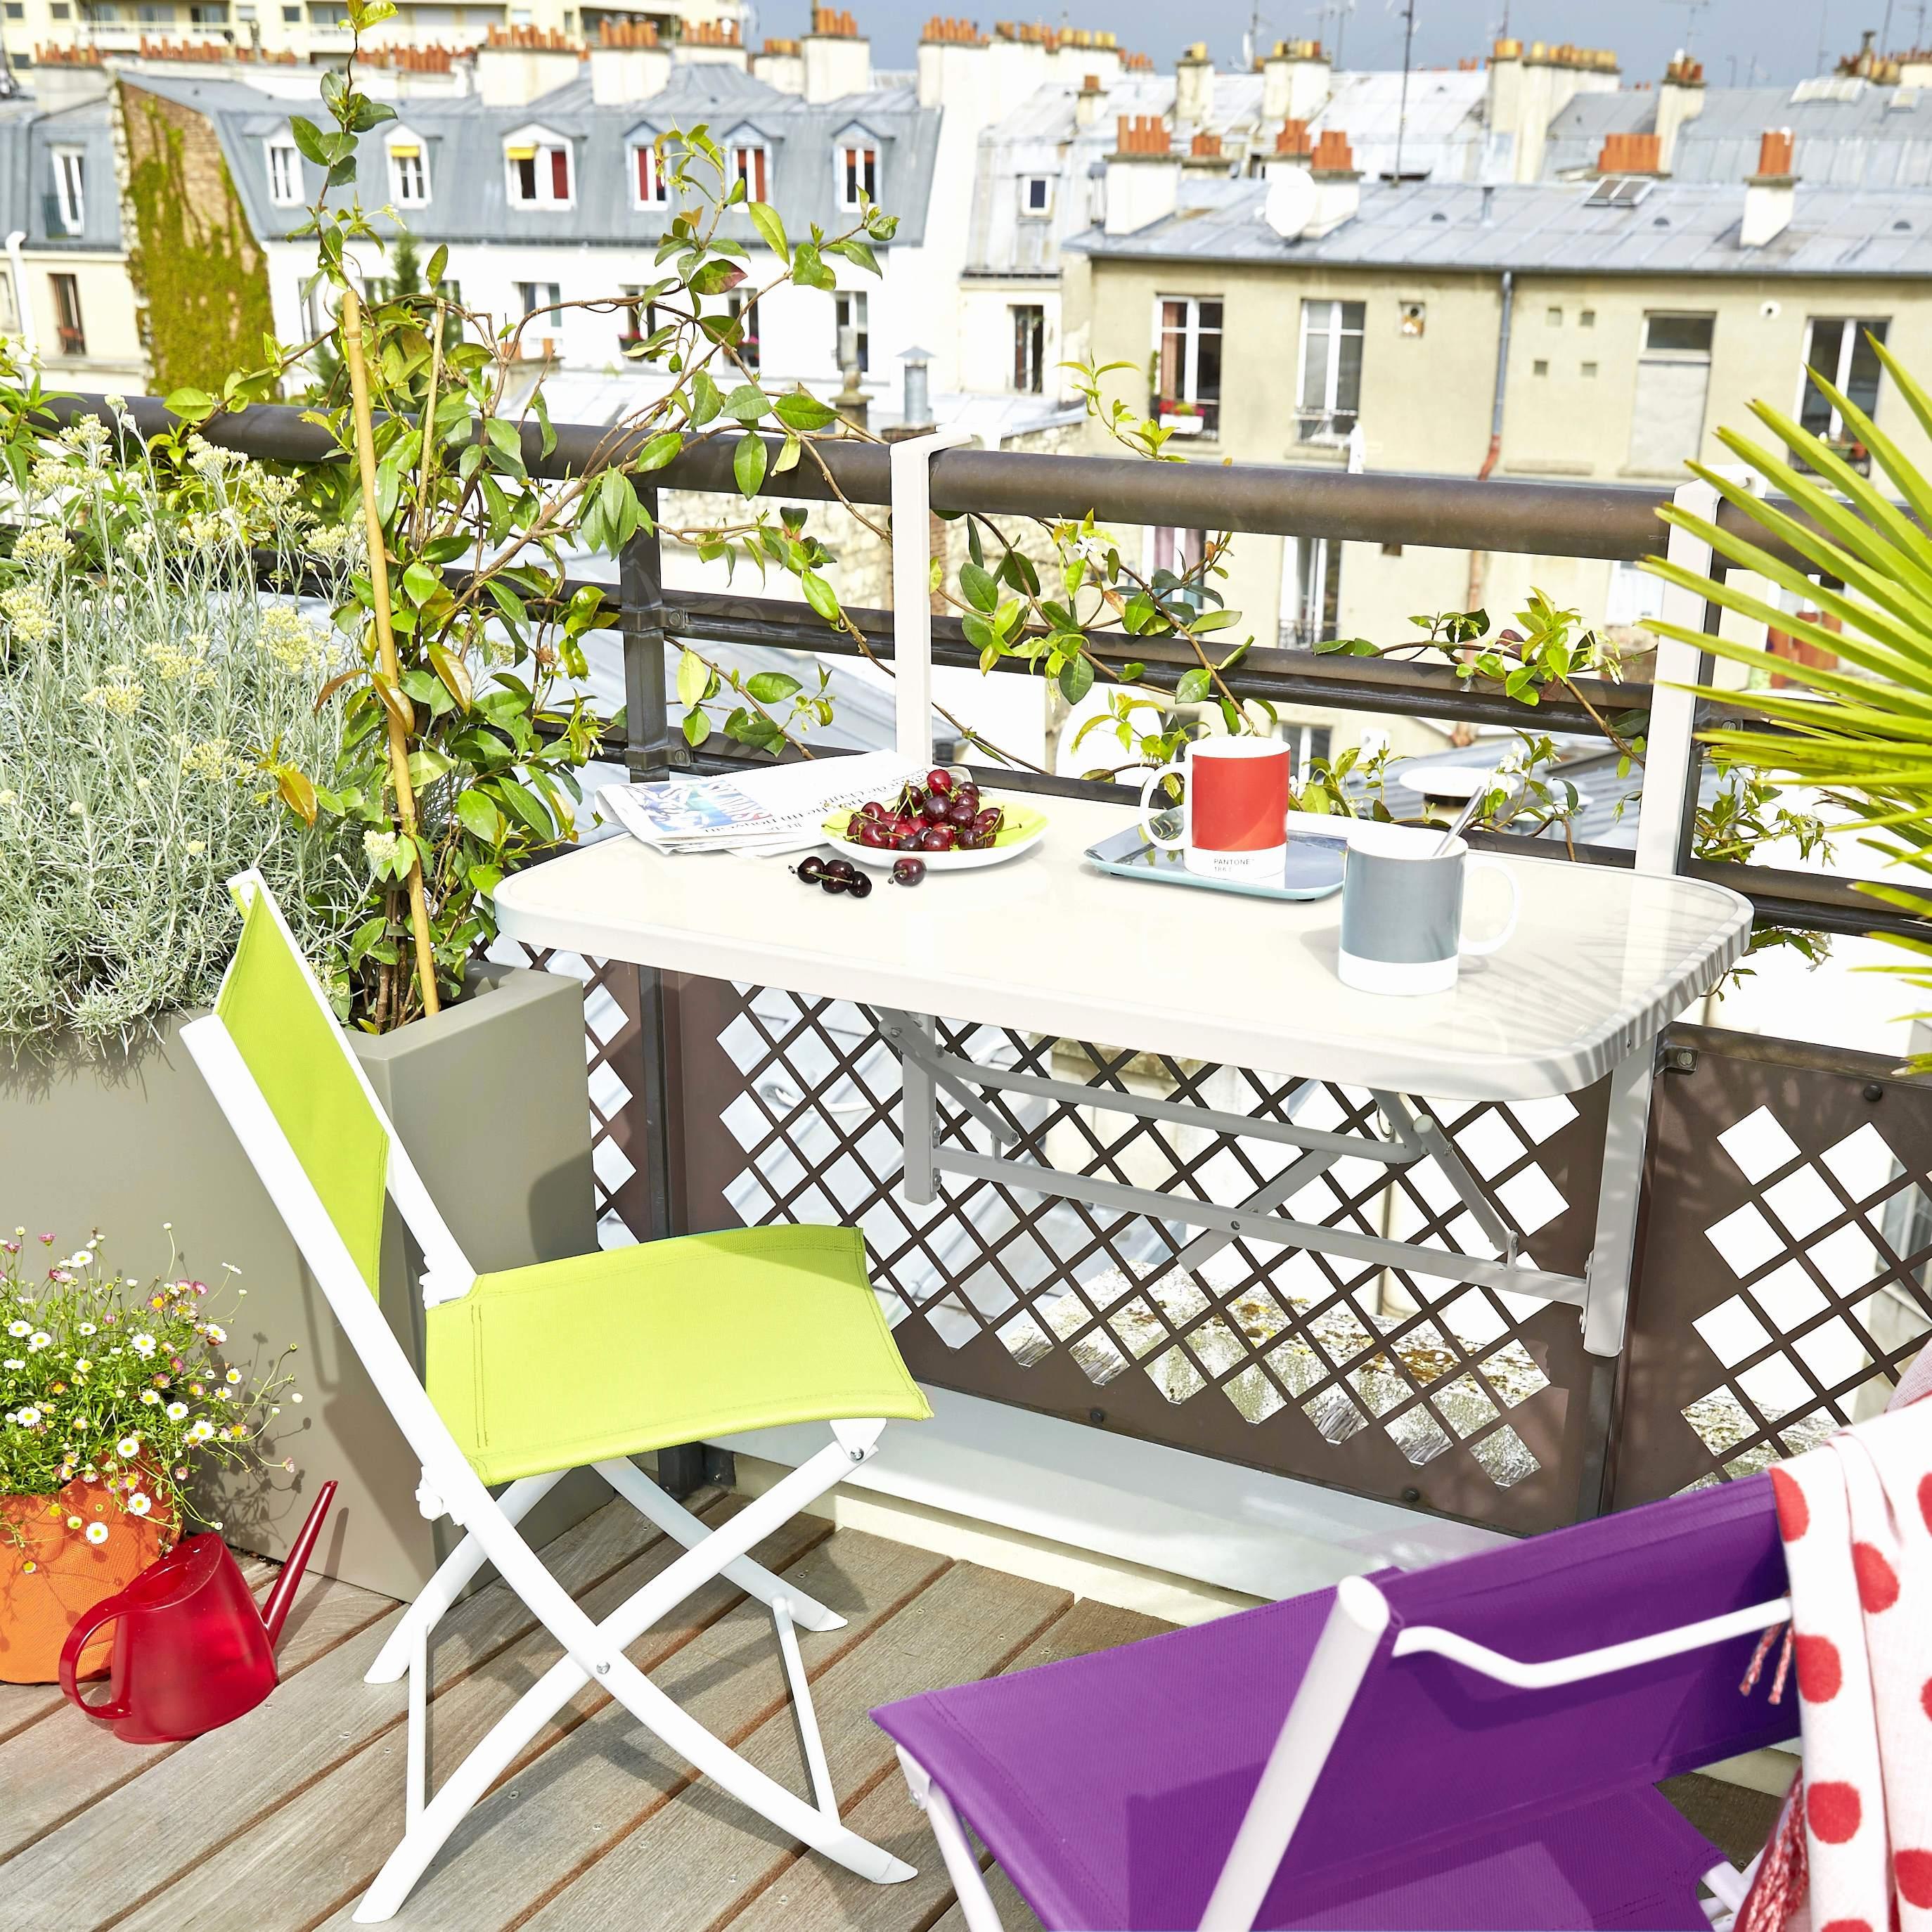 Centrakor Boite De Rangement Inspirant Images 13 Meilleur De Table De Jardin Centrakor Galerie De Cuisine Jardin